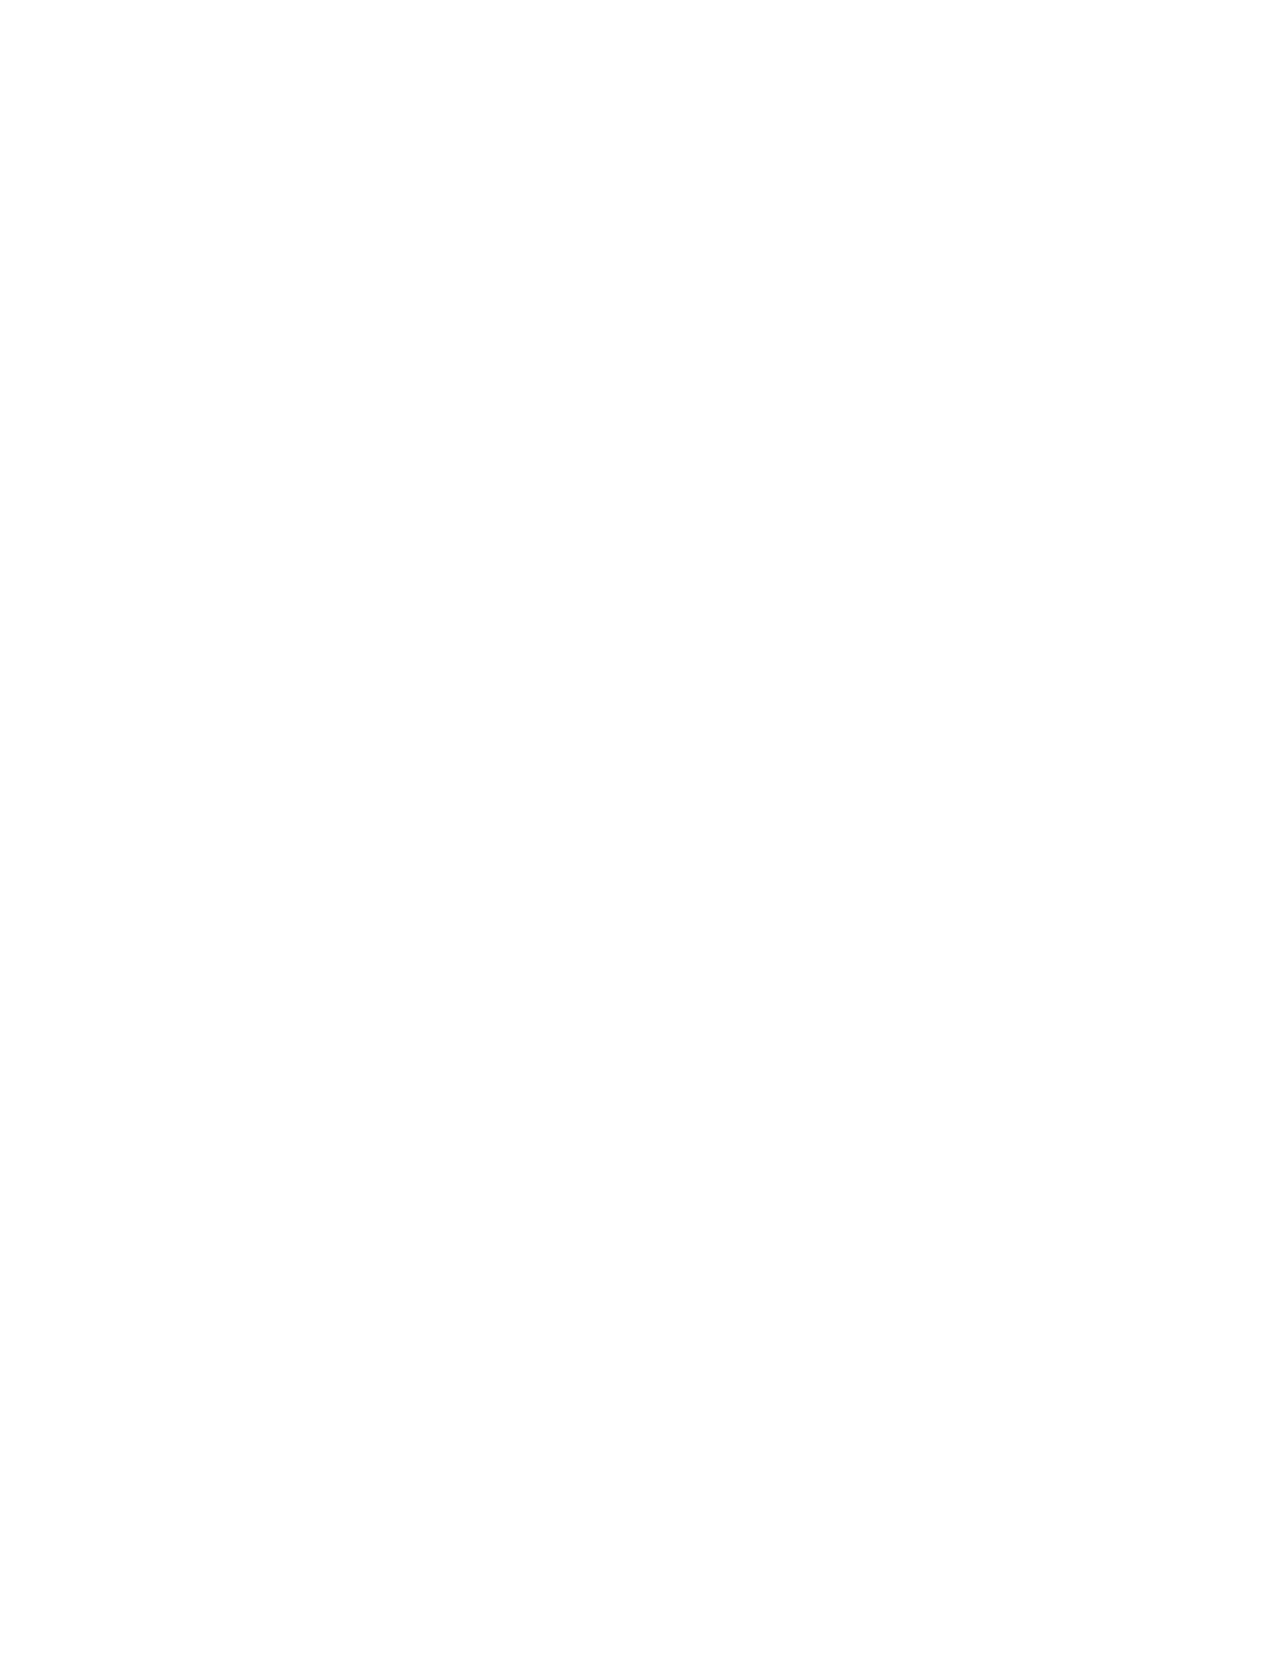 https://digital.tessmann.it/mediaArchive/media/image/Page/SNL/1965/01_07_1965/SNL_1965_07_01_6_object_2135732.png?auth=ec1371e8383de7aee103c938c3529ae6